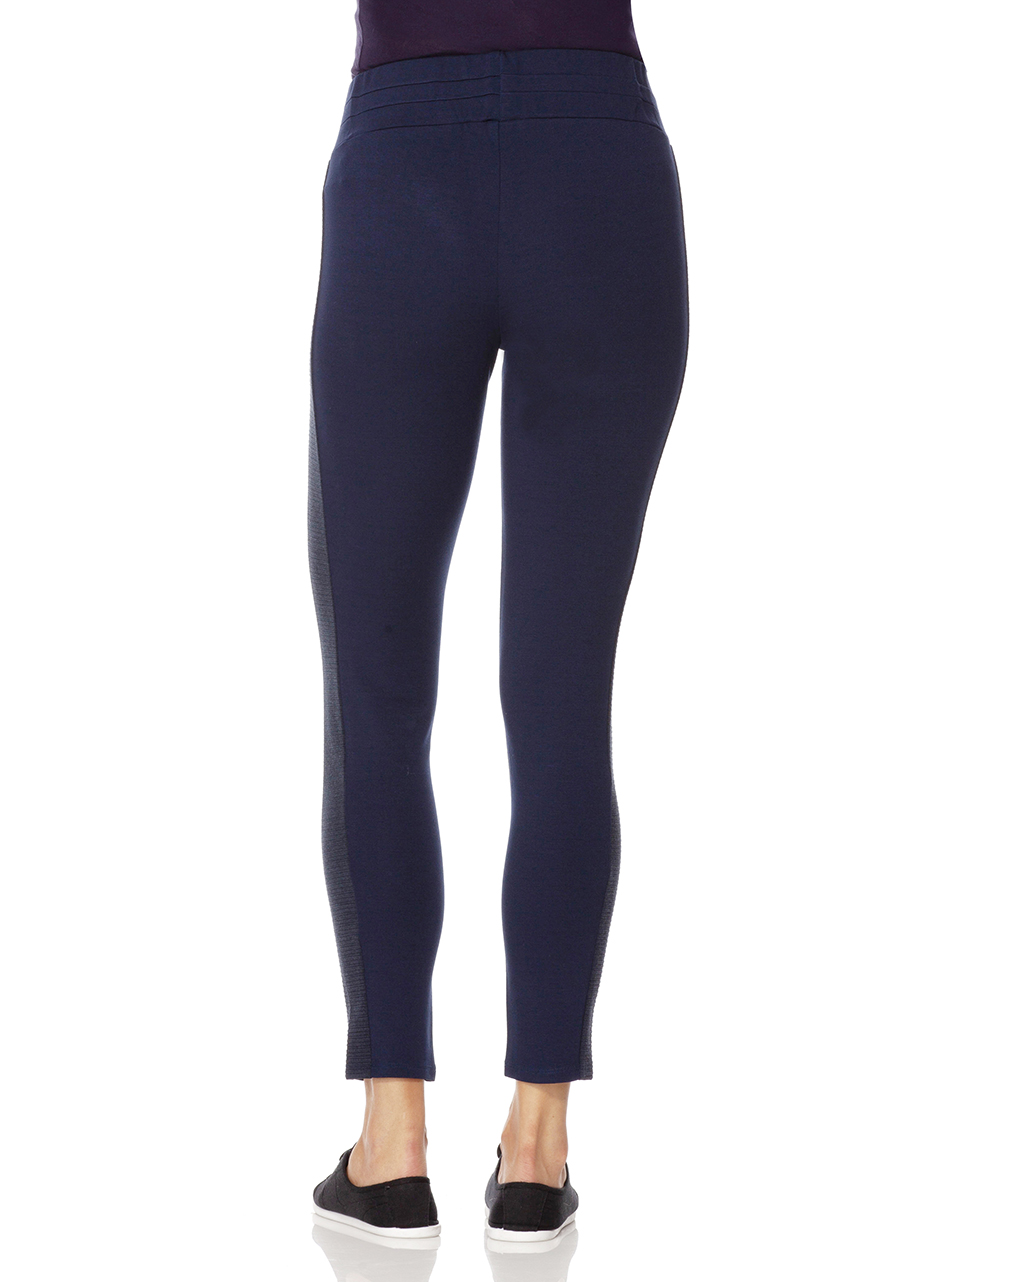 Leggings a punto milano blu scuro - Prénatal